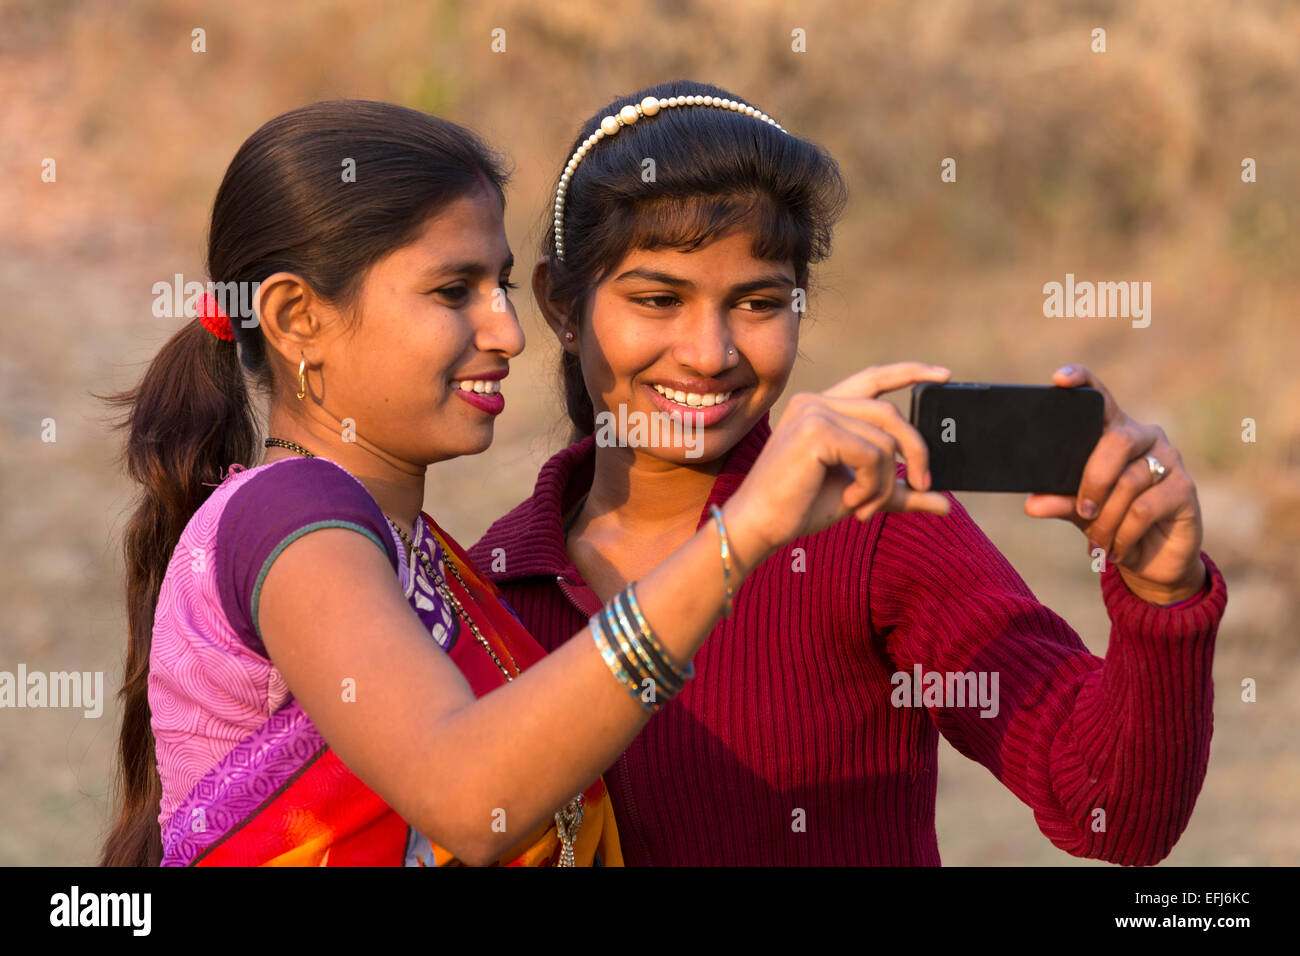 India, Uttar Pradesh, Agra, due sorelle tenendo selfie Immagini Stock